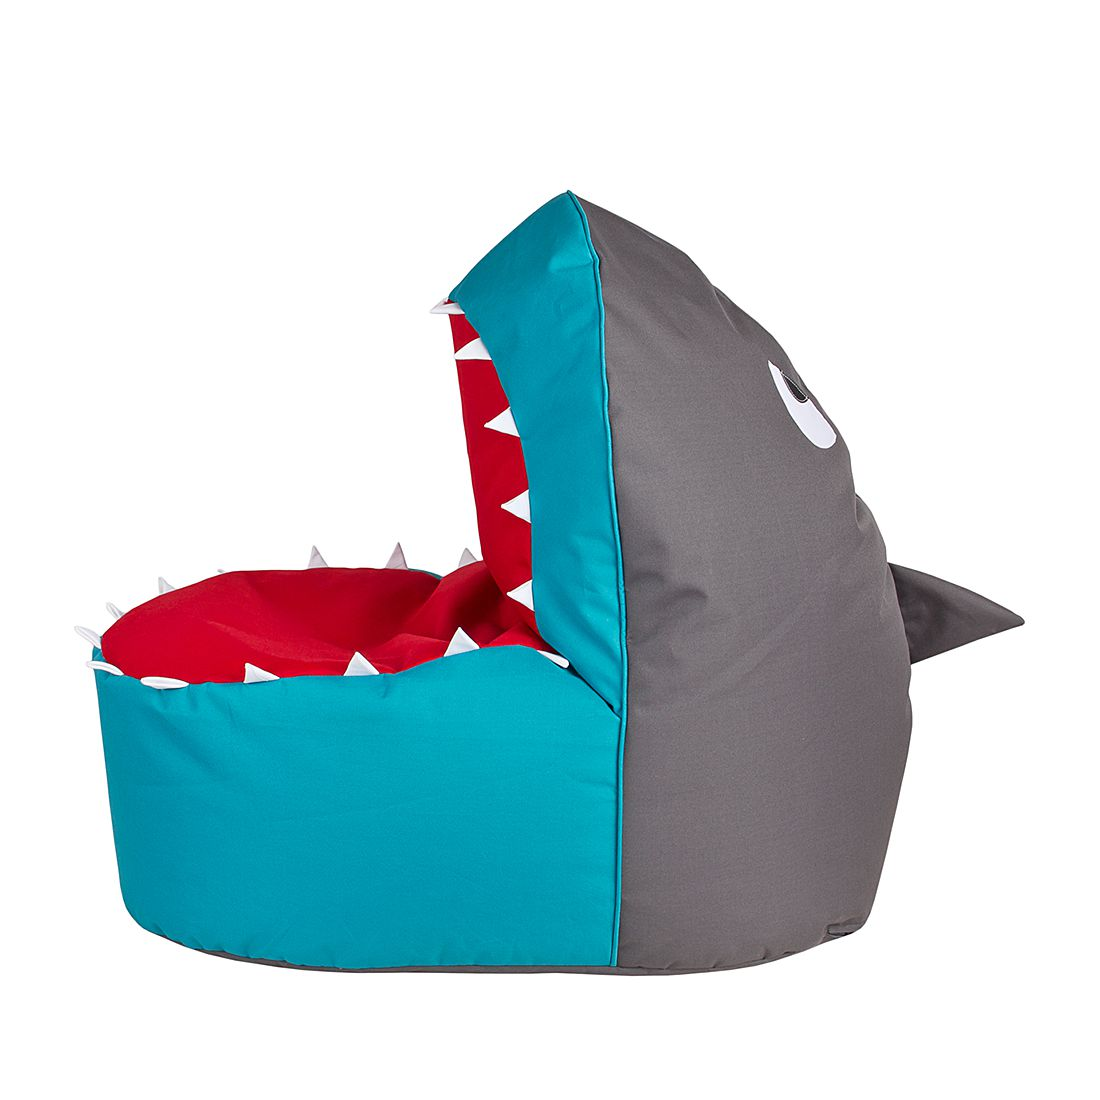 Sitzsack Shark Brava, Fredriks online kaufen